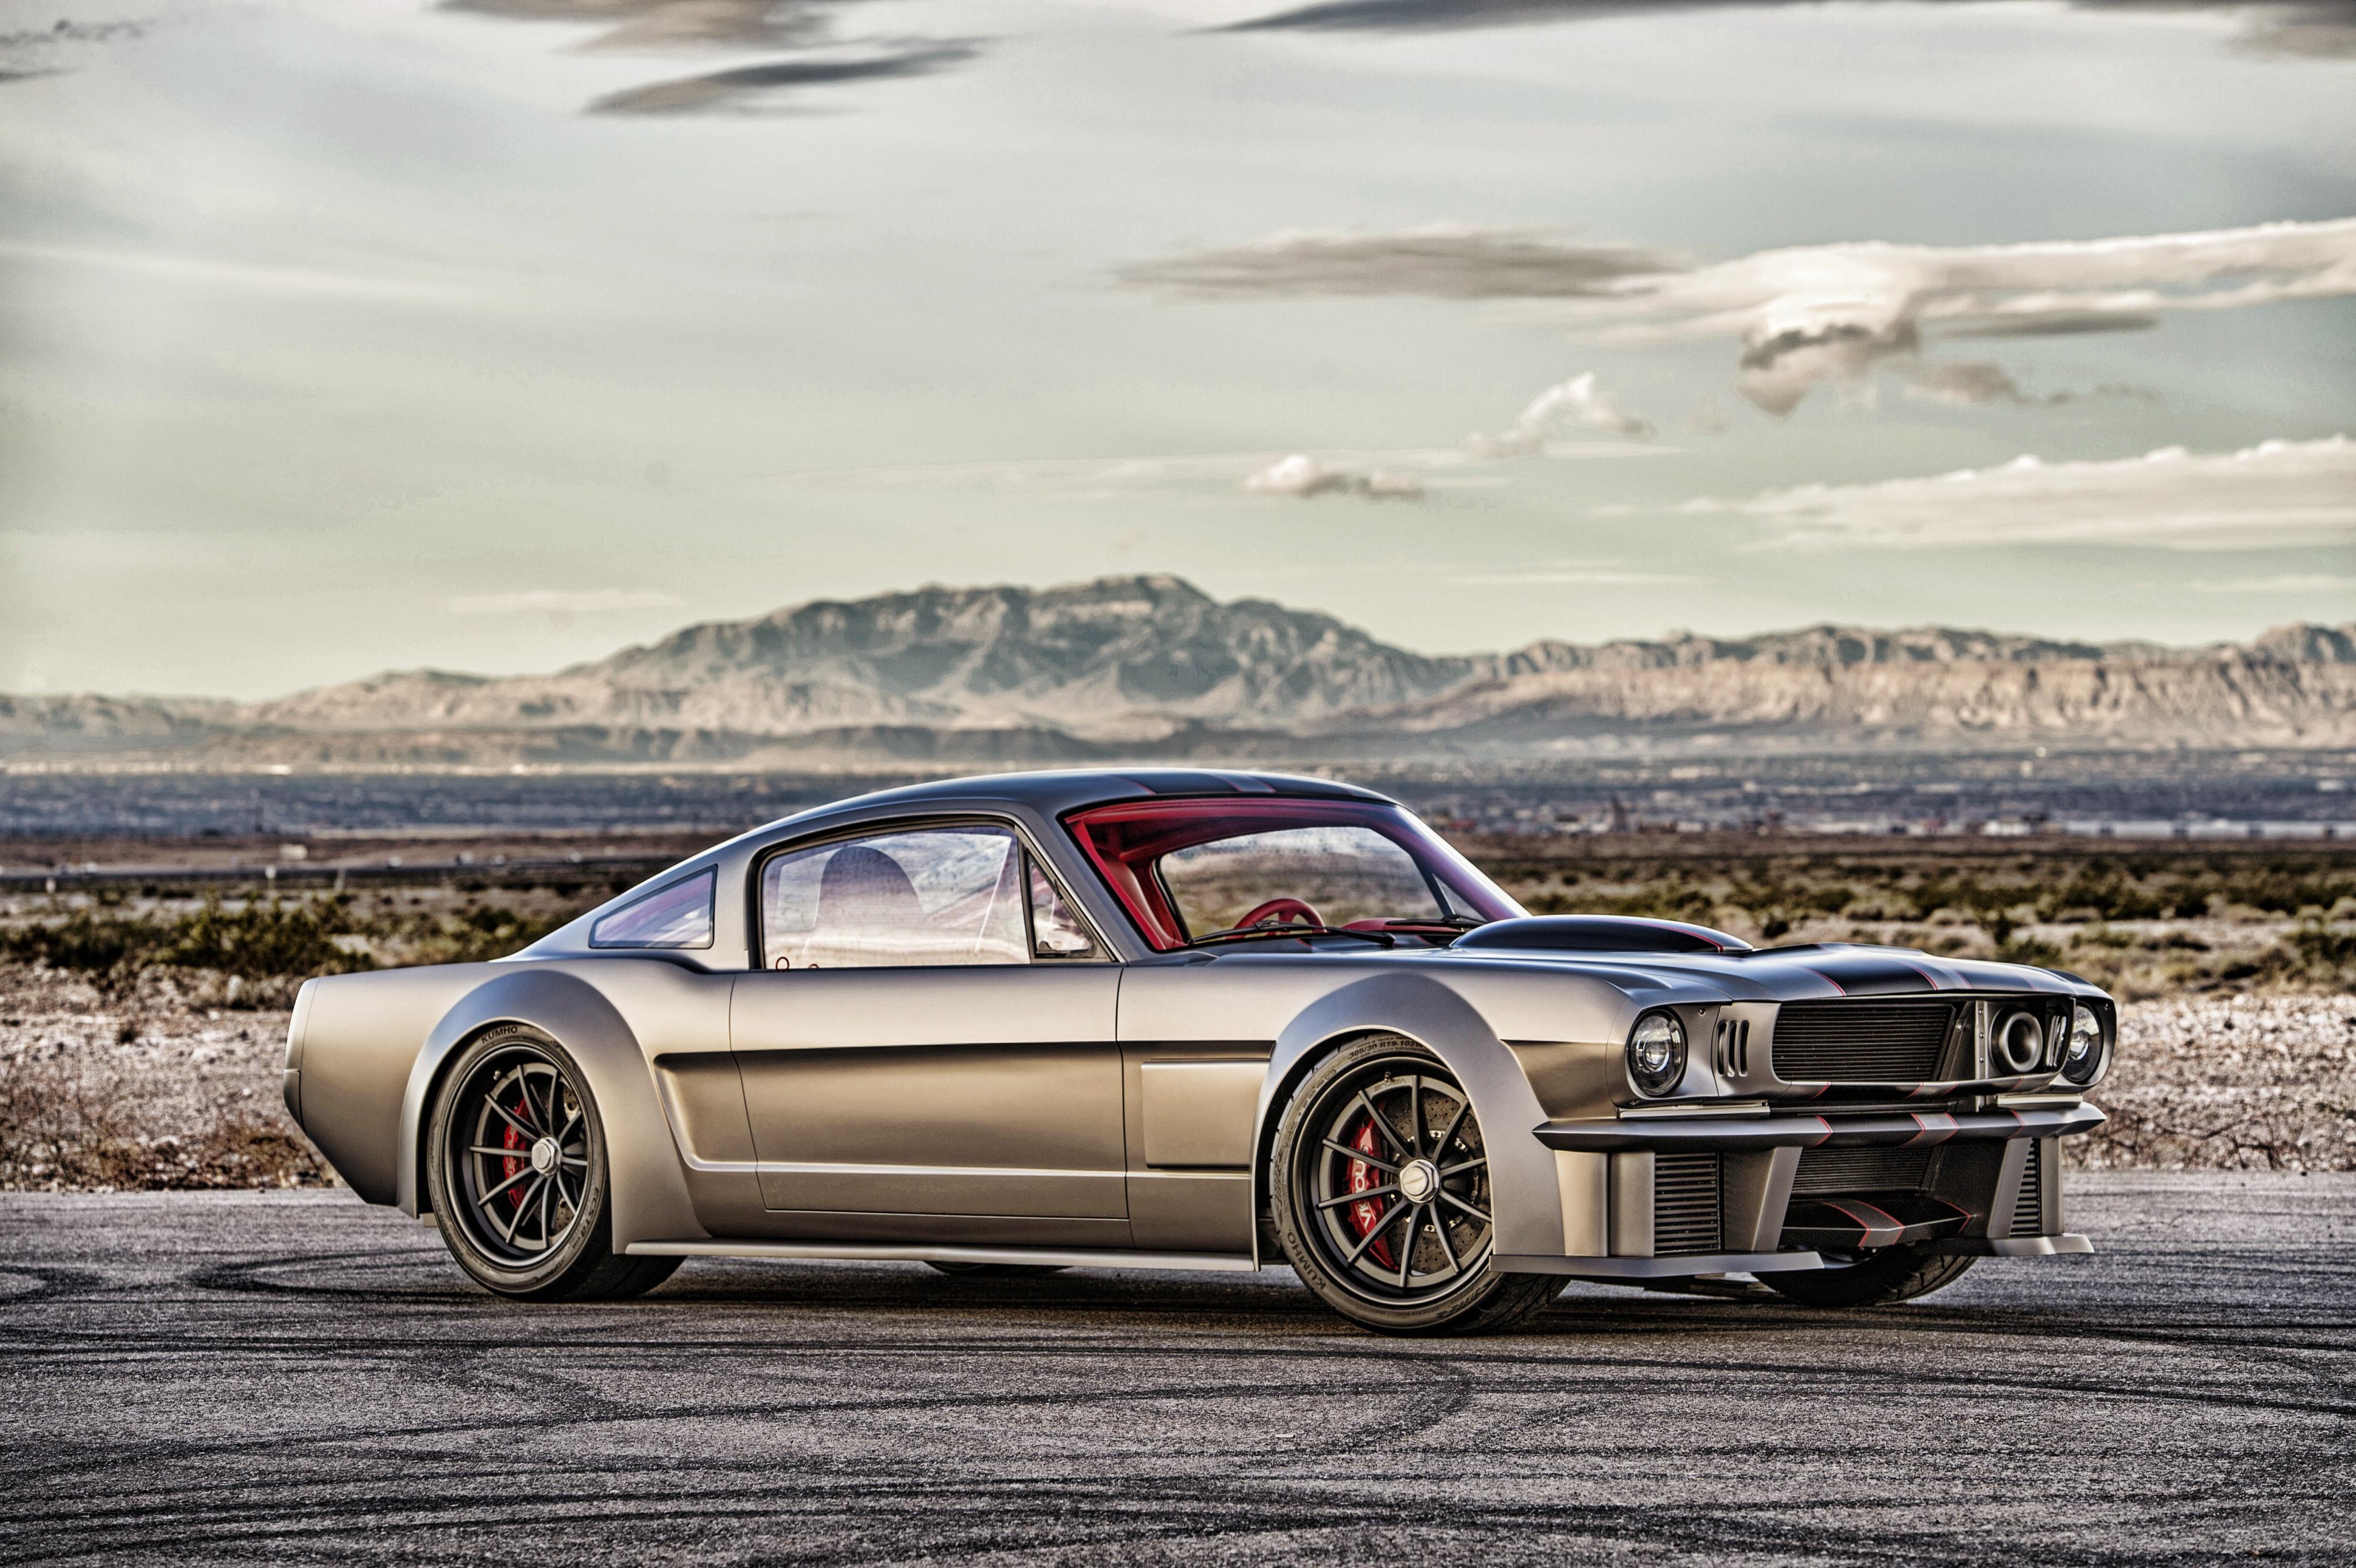 ford mustang 1965 4k 1608910461 - Ford Mustang 1965 4k - Ford Mustang 1965 4k wallpapers